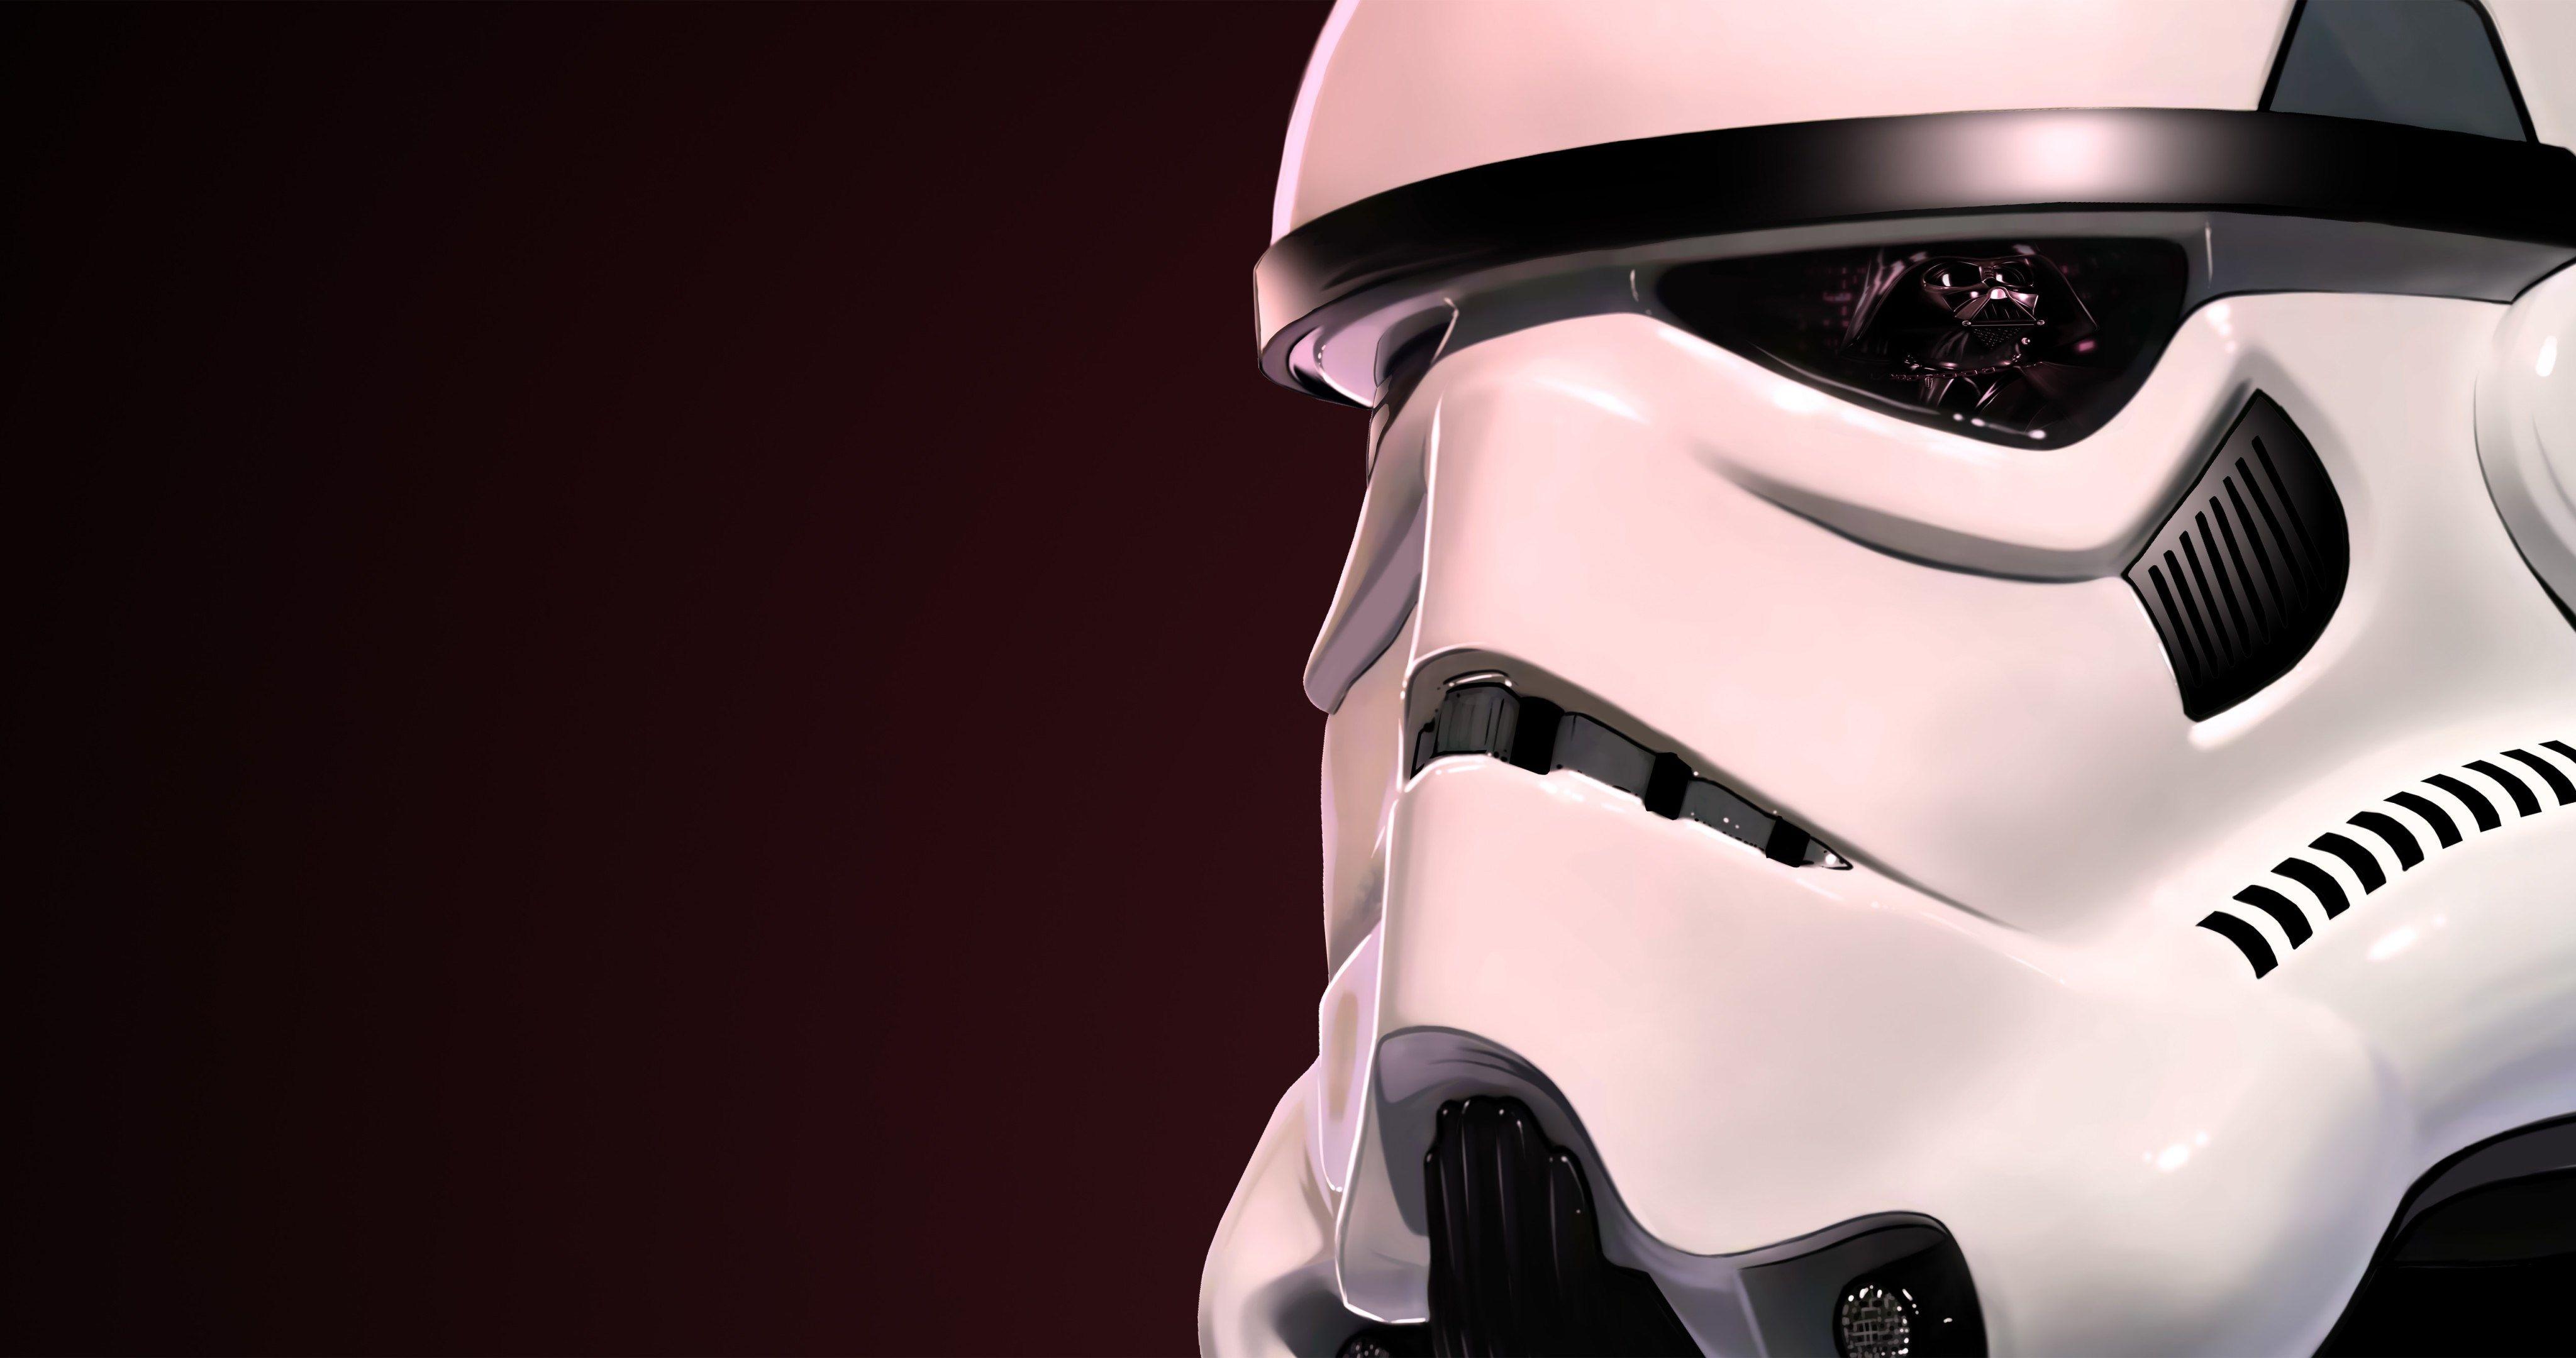 Storm Trooper Helmet 4k Ultra Hd Wallpaper Star Wars Wallpaper Stormtrooper Stormtrooper Helmet